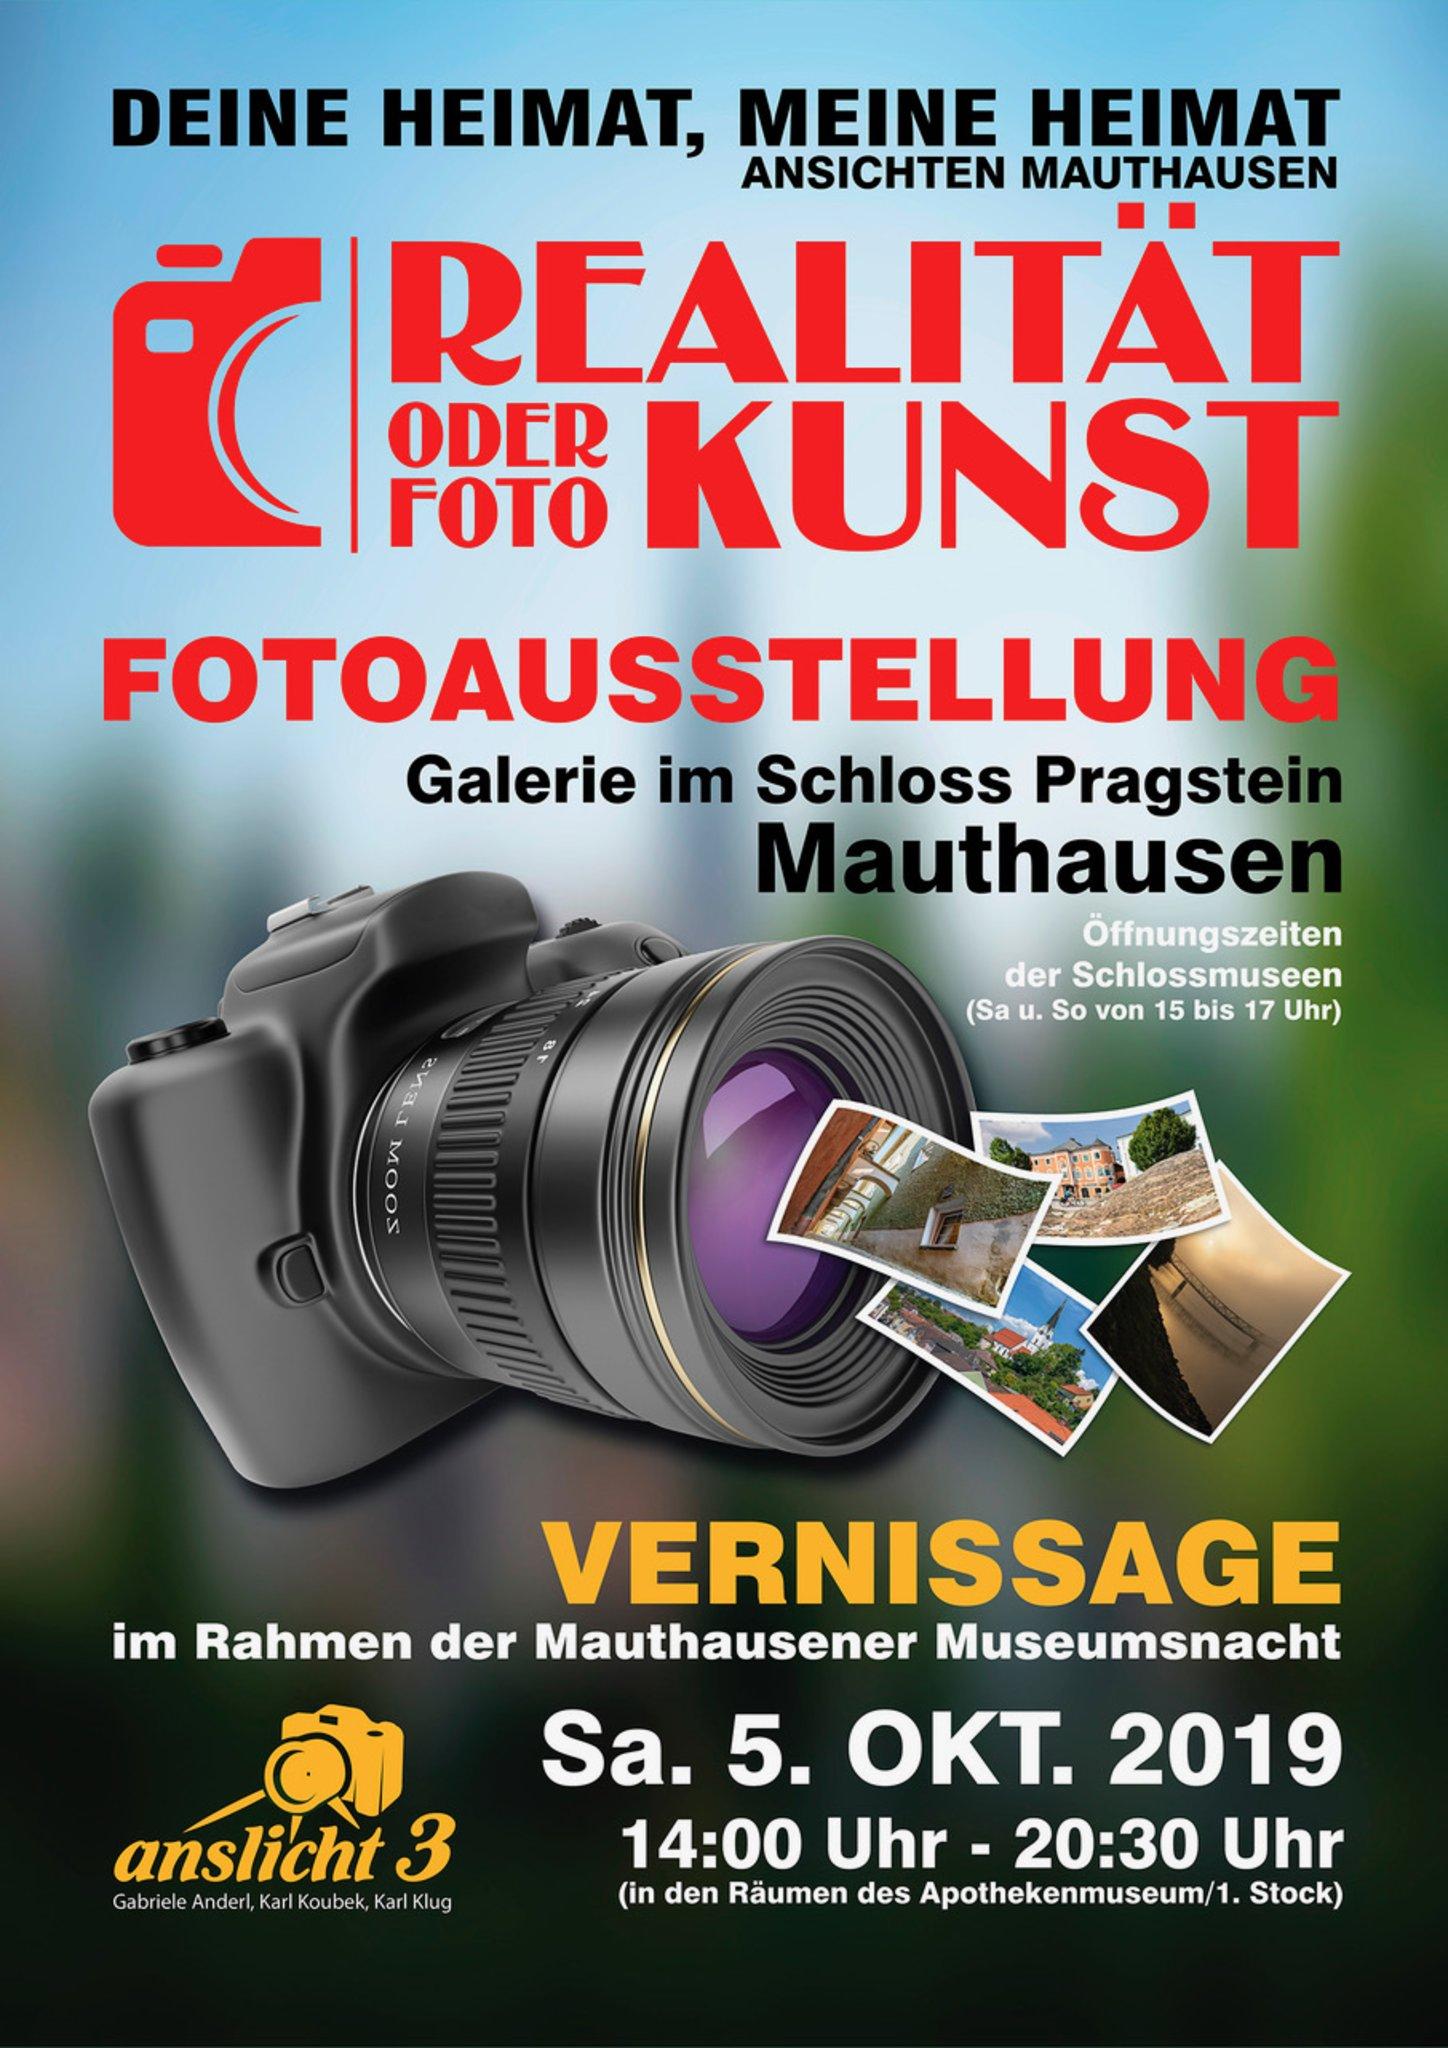 Reisewelt GmbH, 4310 Mauthausen, Reisebro | HEROLD